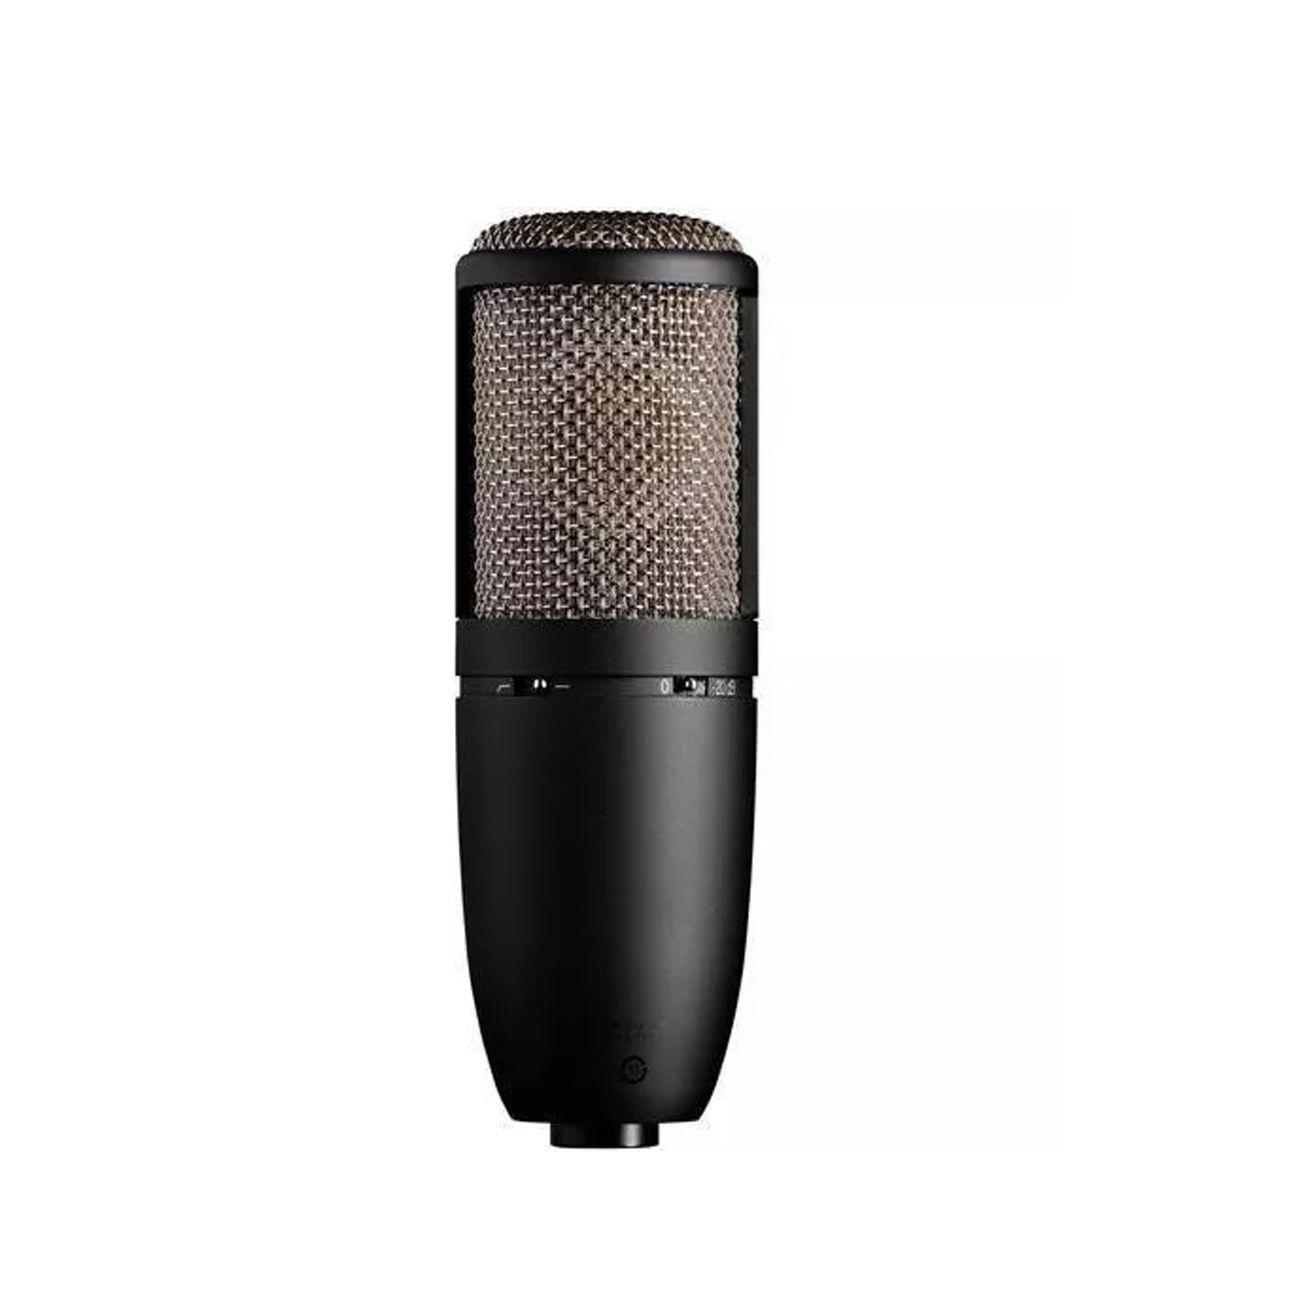 Microfone Condensador P/ Estúdio Akg Perception P420